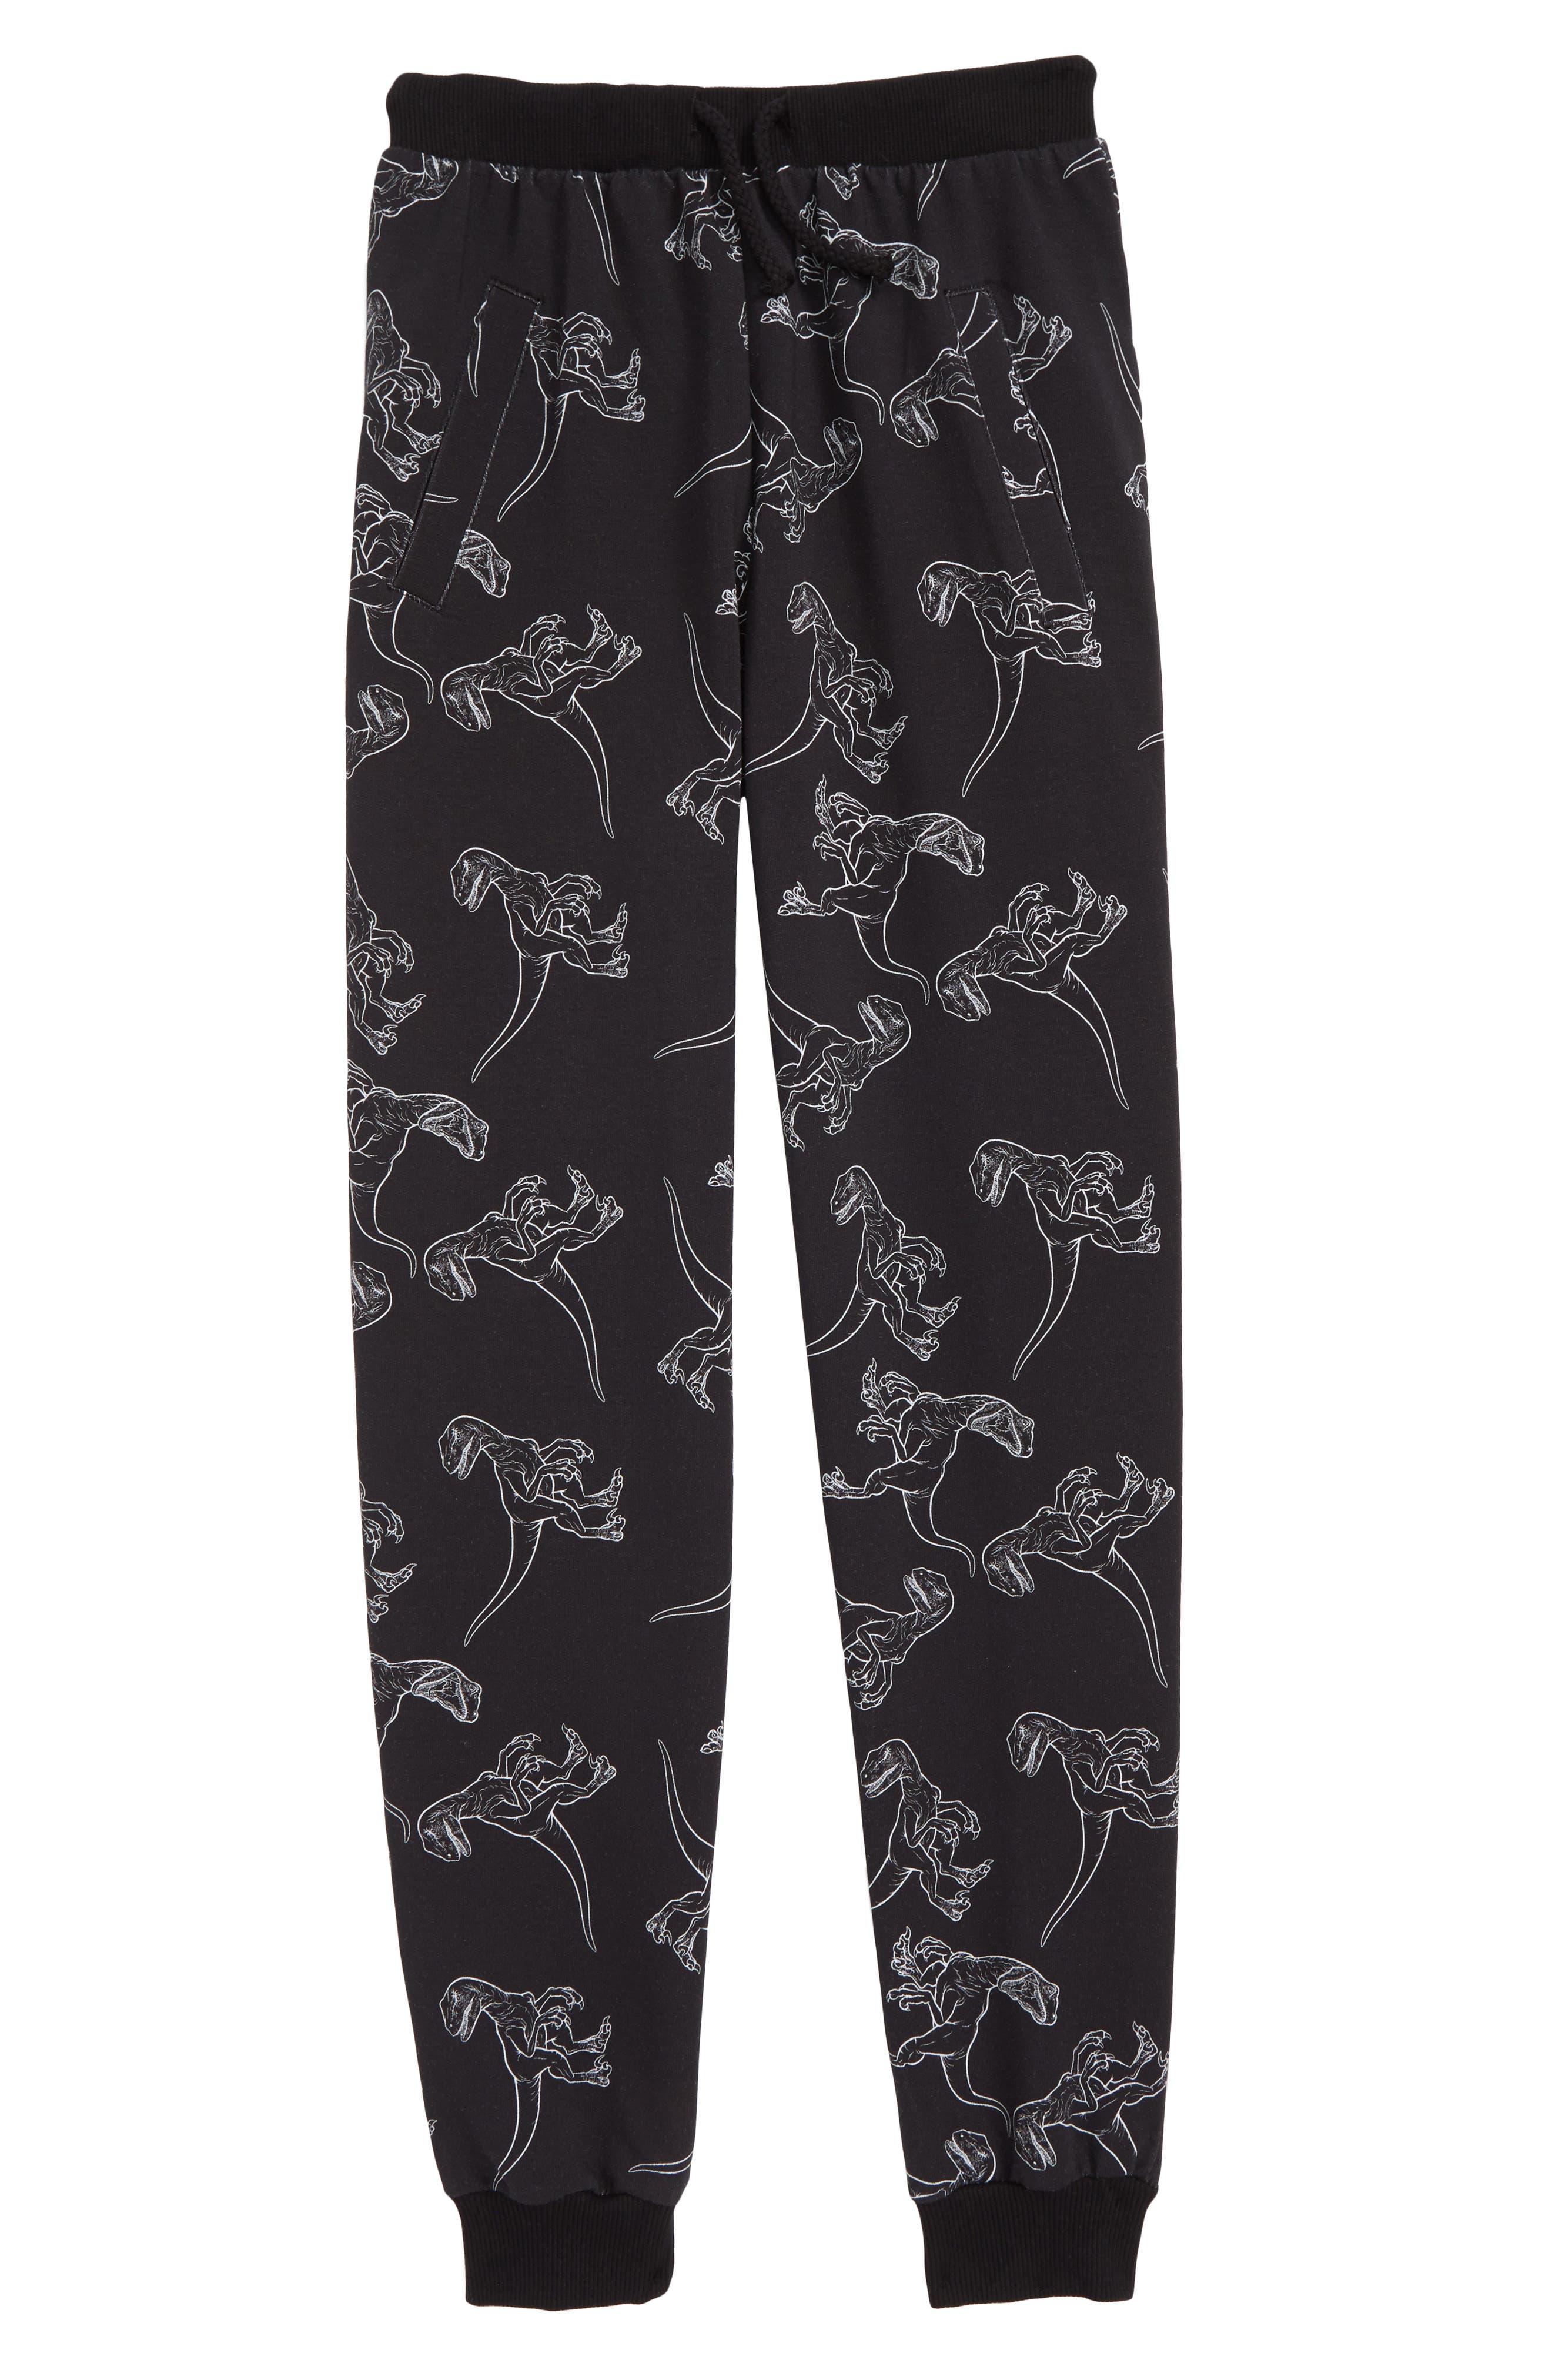 x Jurassic World Isla Sweatpants,                         Main,                         color, Black